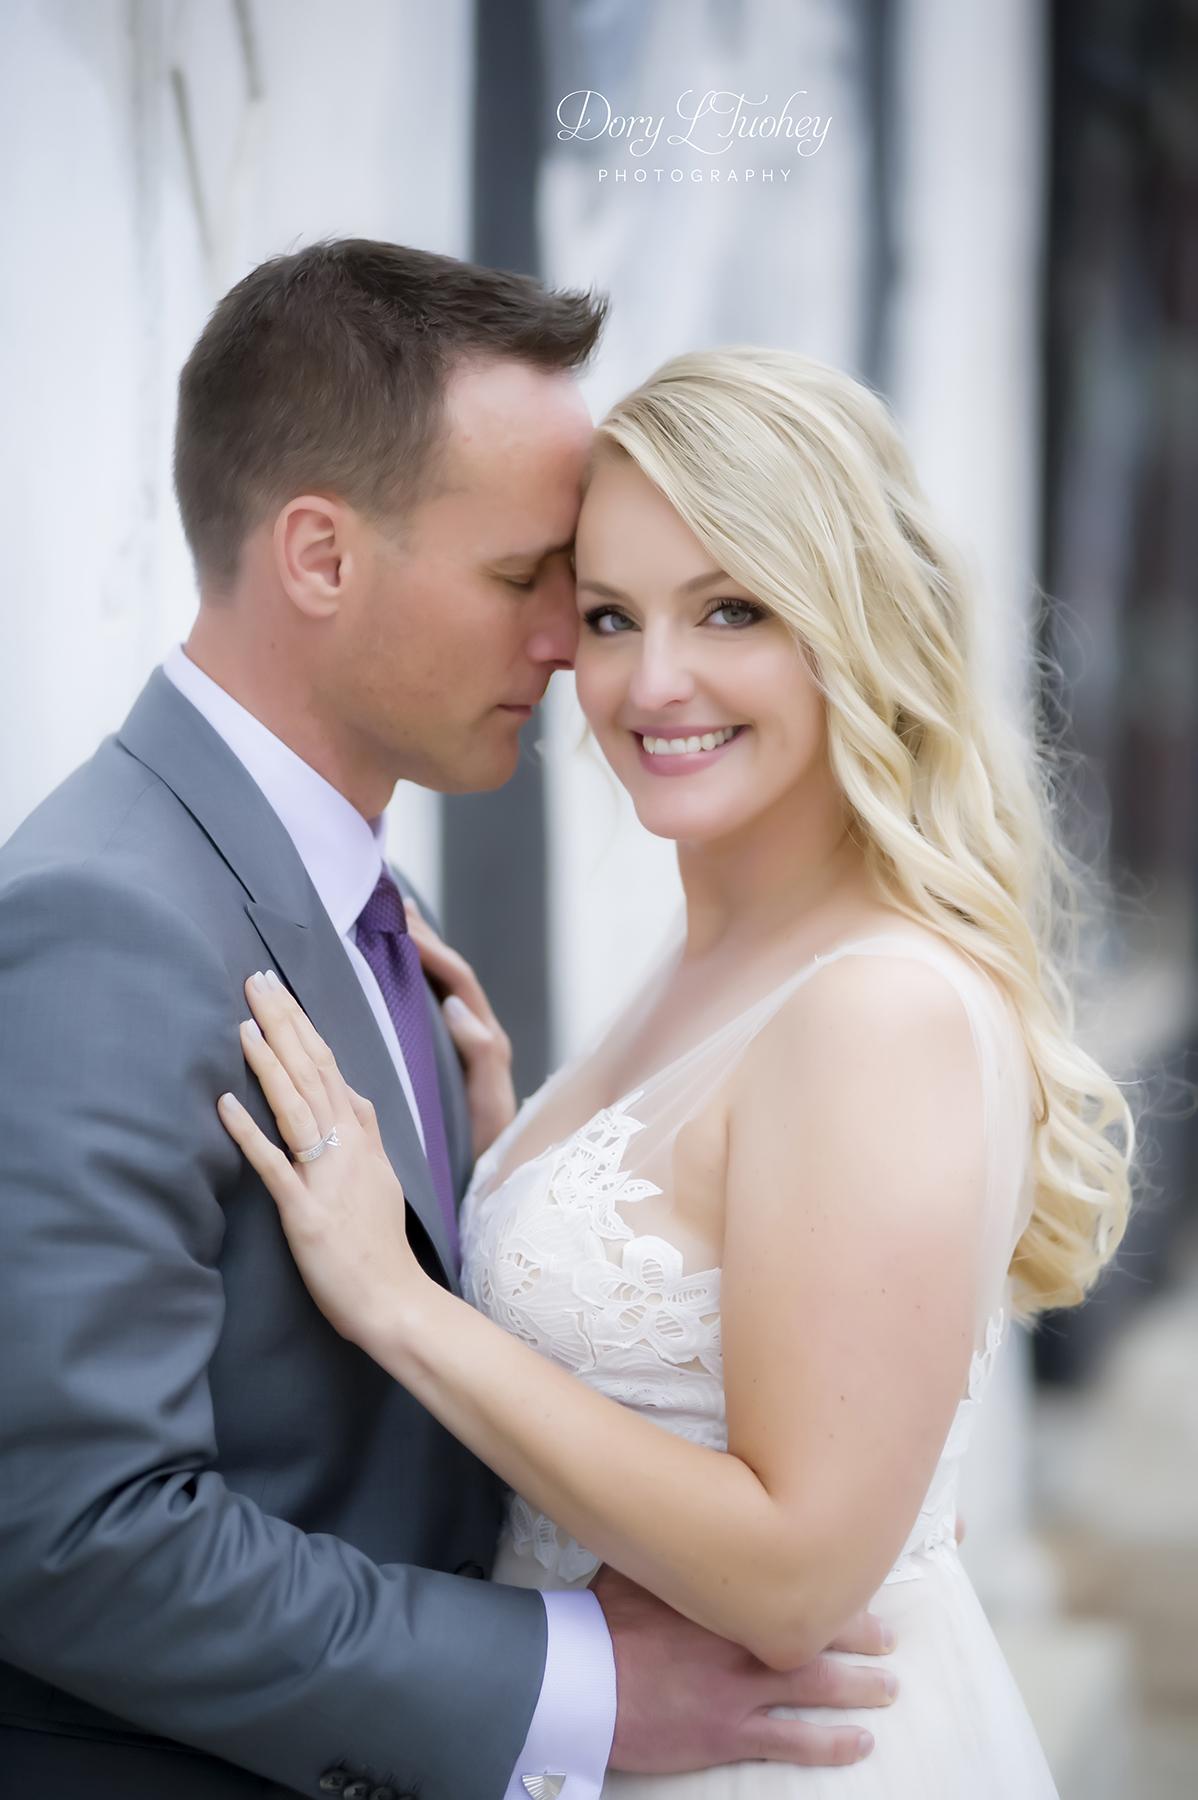 Rookery_chicago_dory_photographer_wedding_stairs_bhldn_love_dawson_10.jpg